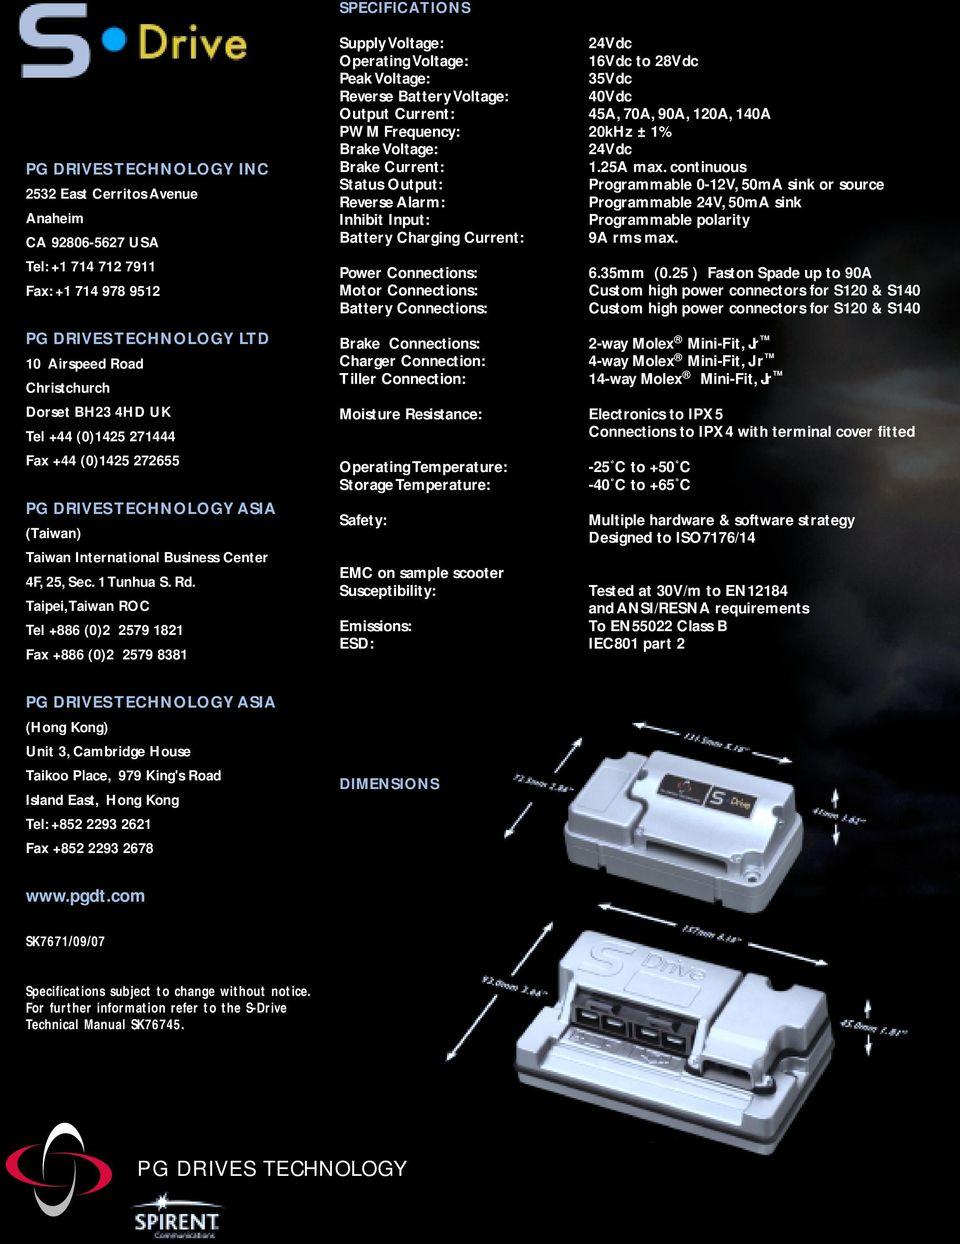 medium resolution of taipei taiwan roc tel 886 0 2 2579 1821 fax 886